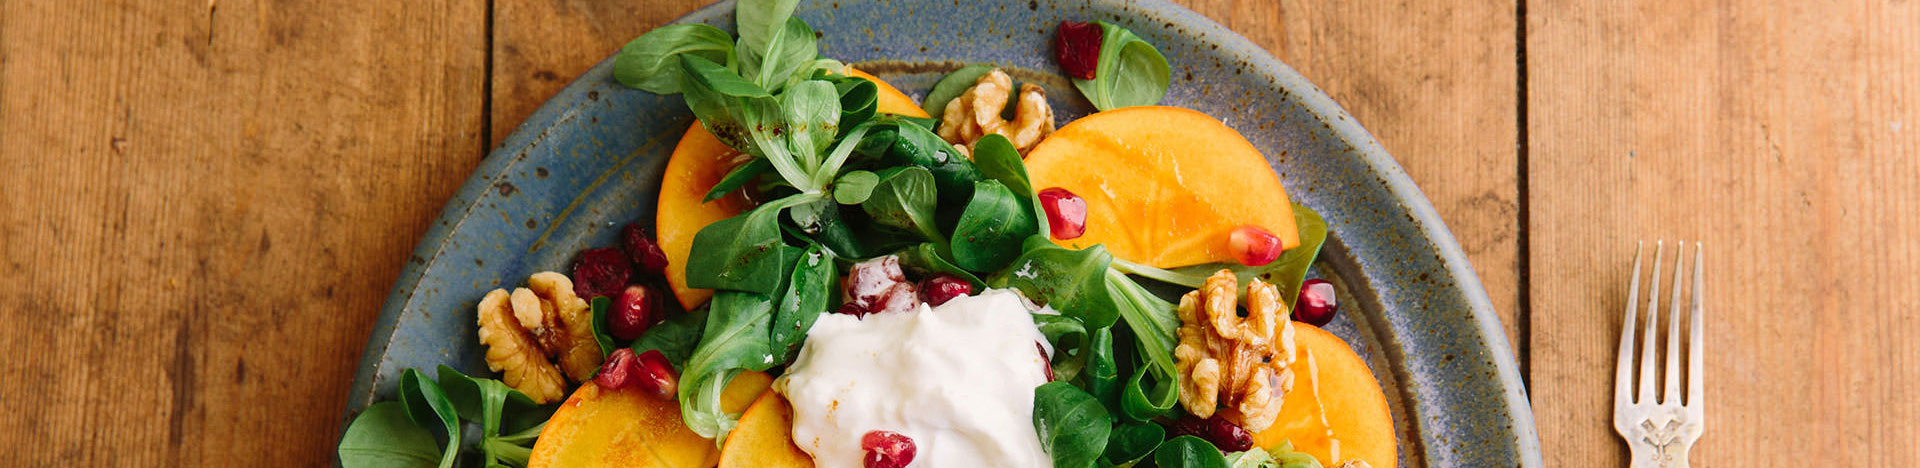 YGYI Salad